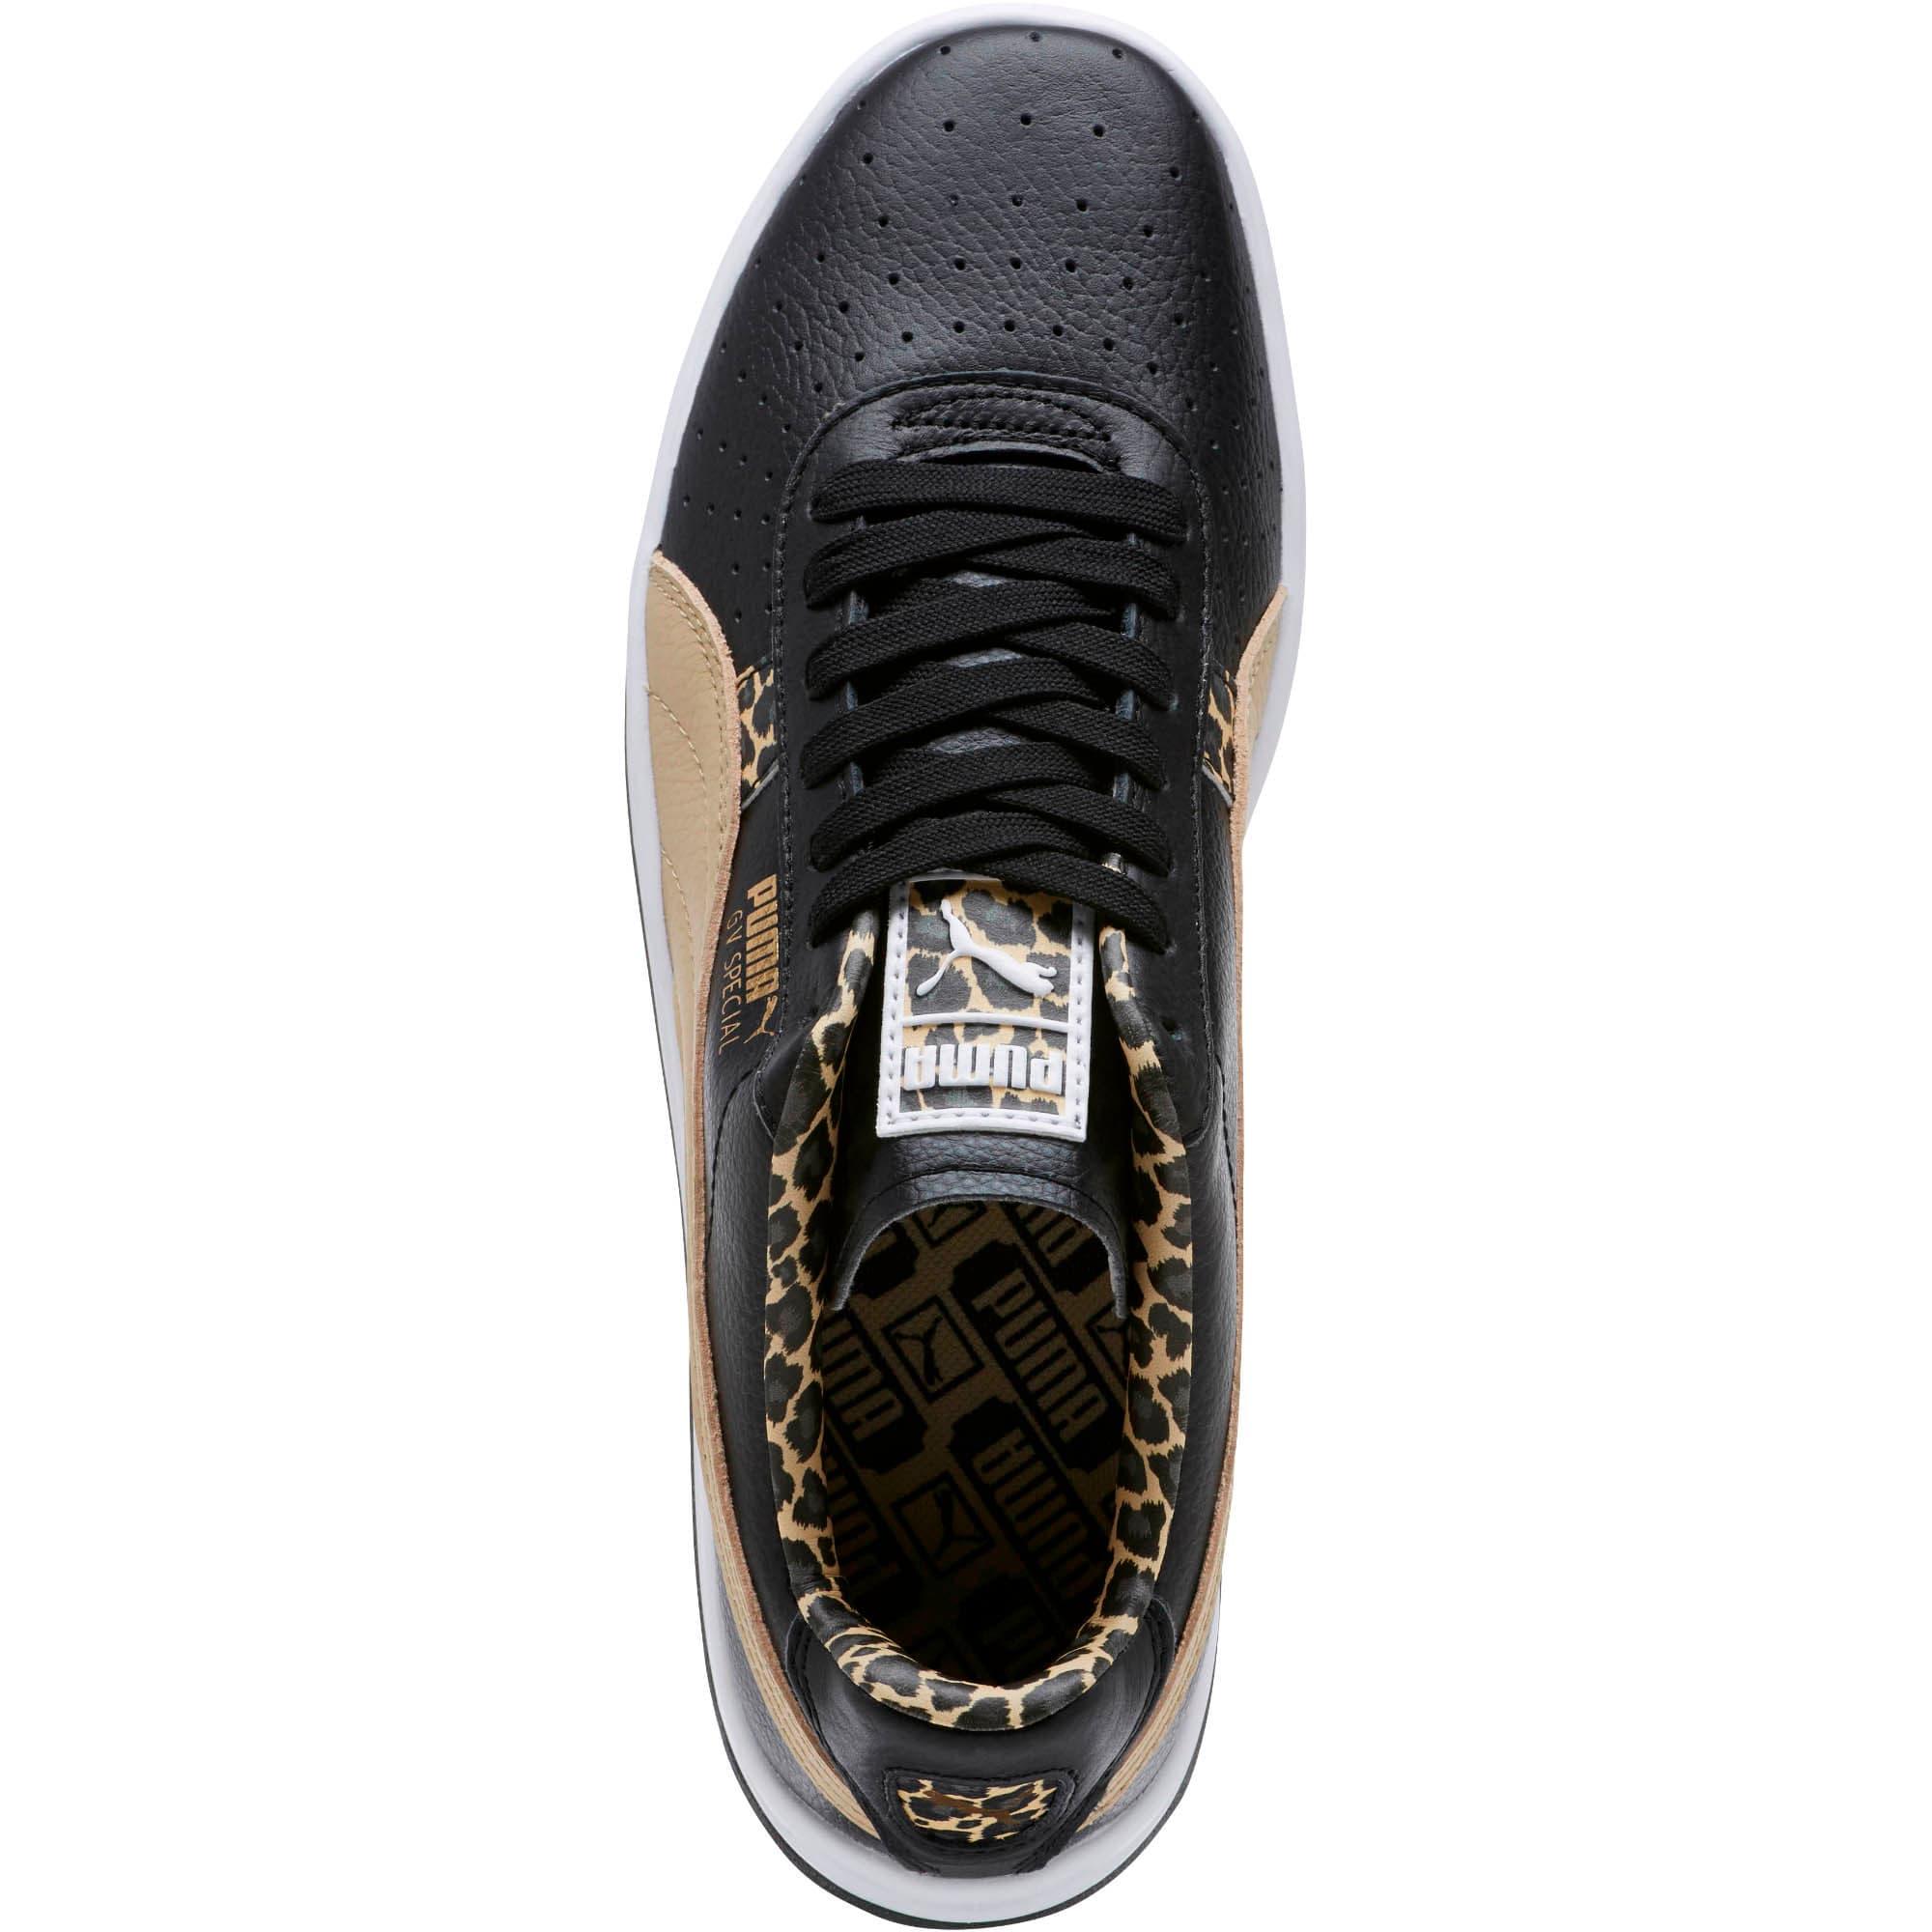 Thumbnail 5 of GV Special Wild Sneakers, Black-Pebble-Puma Team Gold, medium